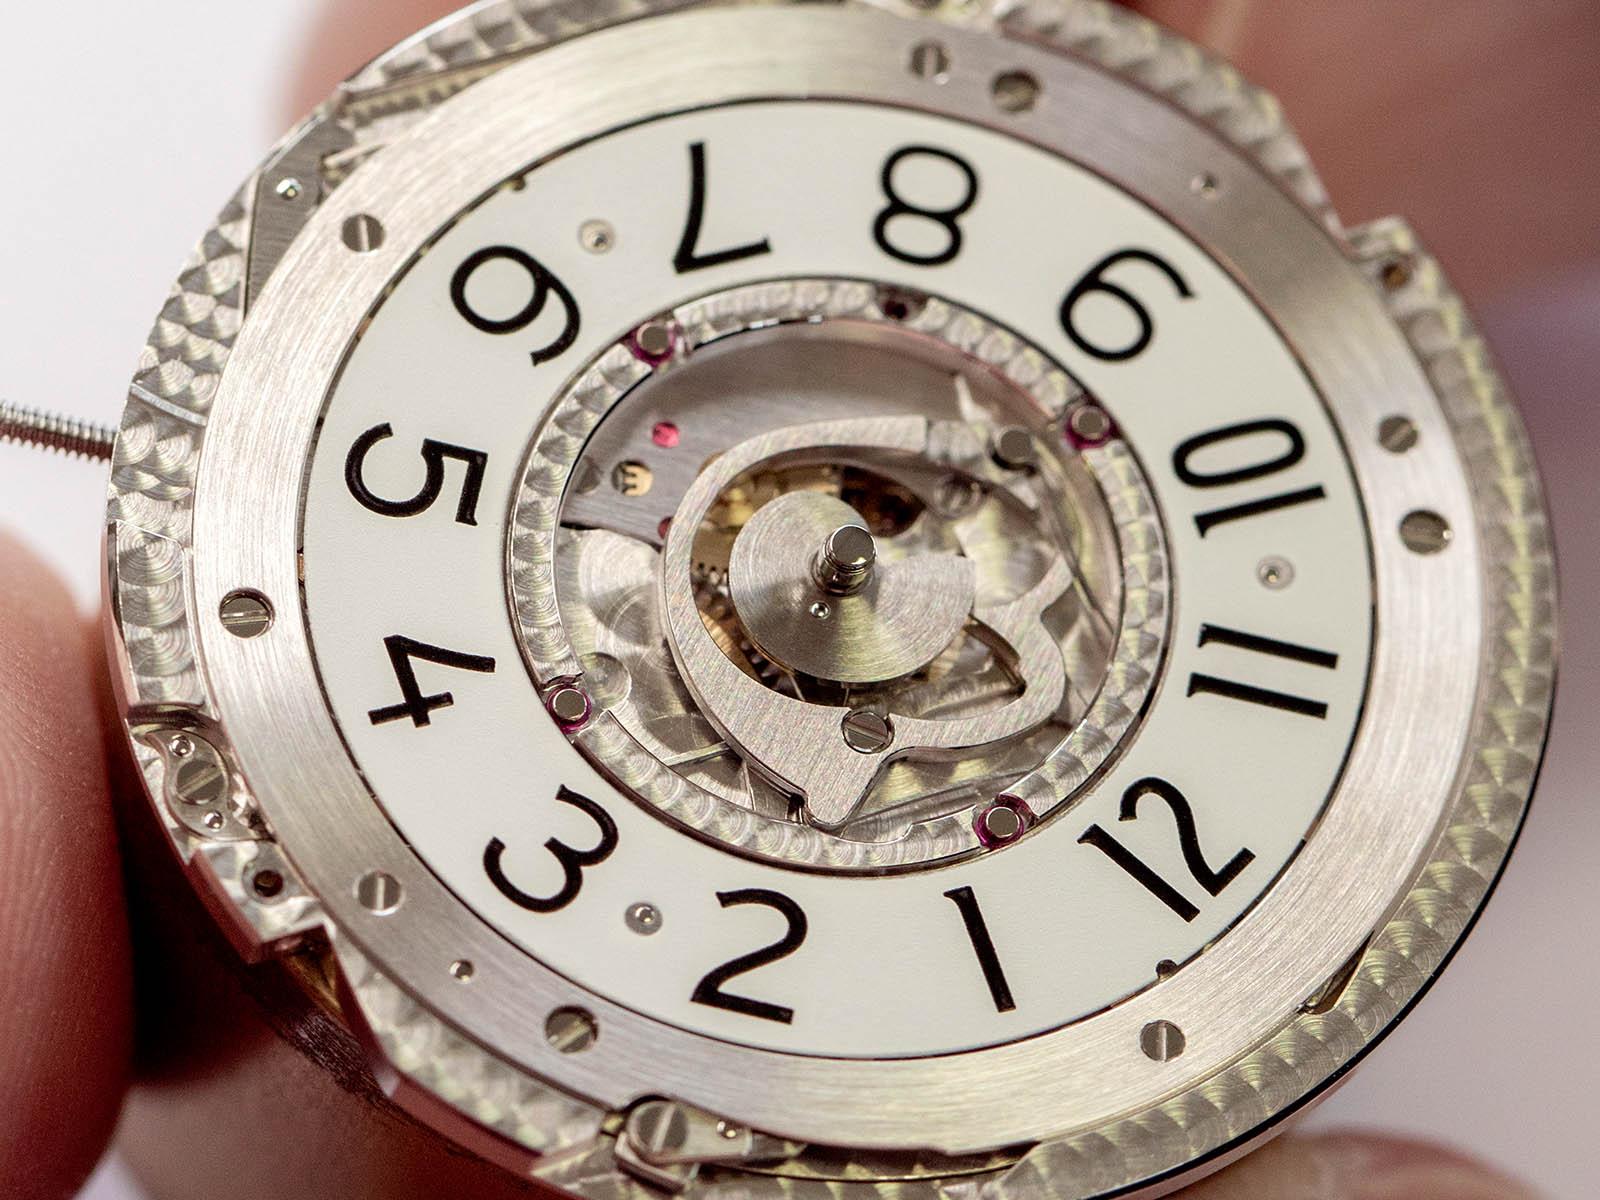 161977-5001-chopard-l-u-c-quattro-spirit-25-5.jpg